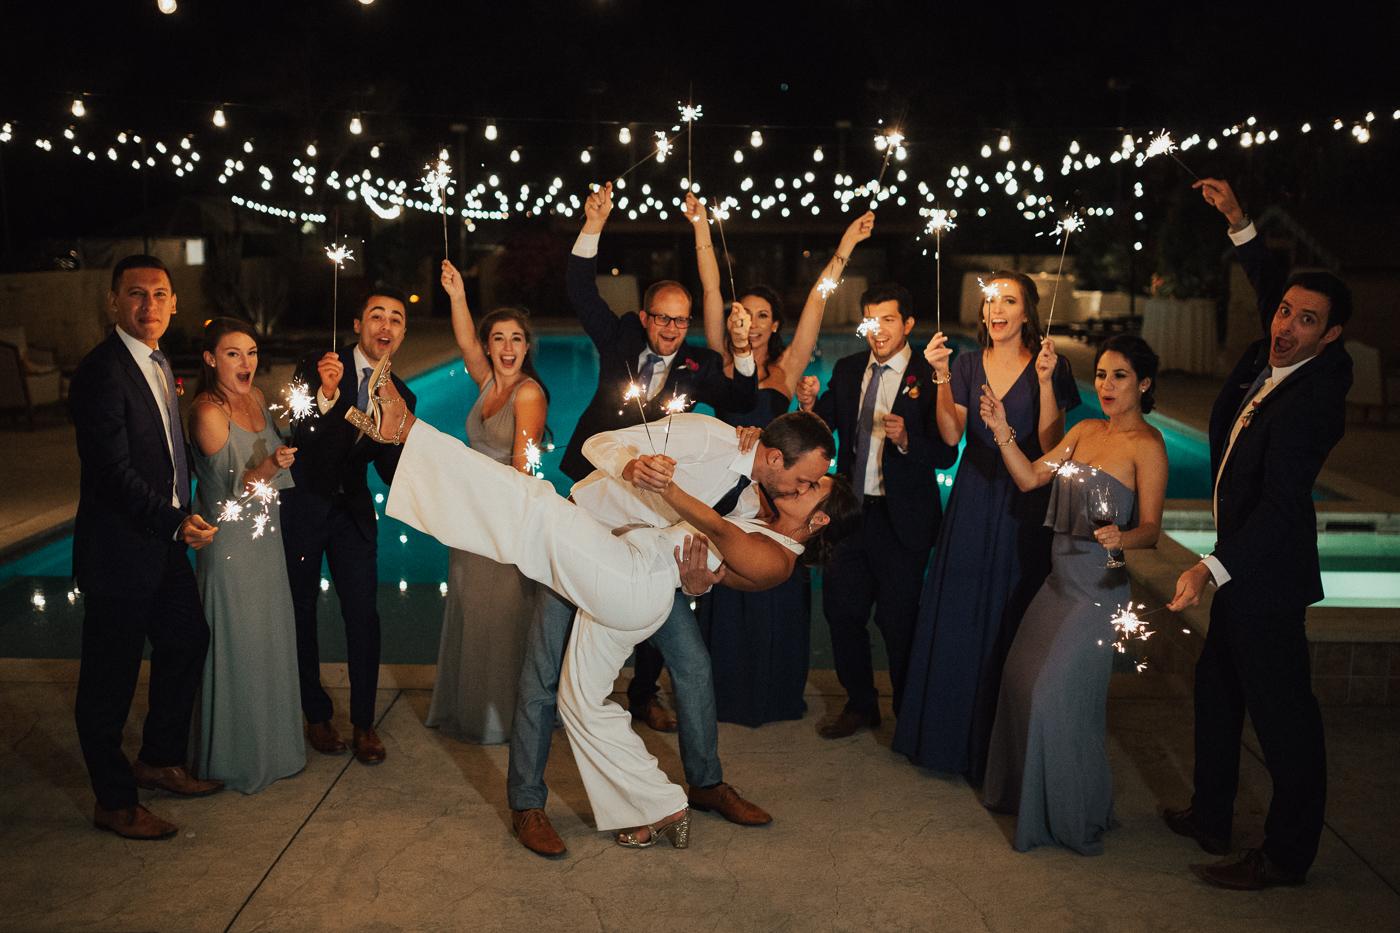 Wedding party sparkler photo